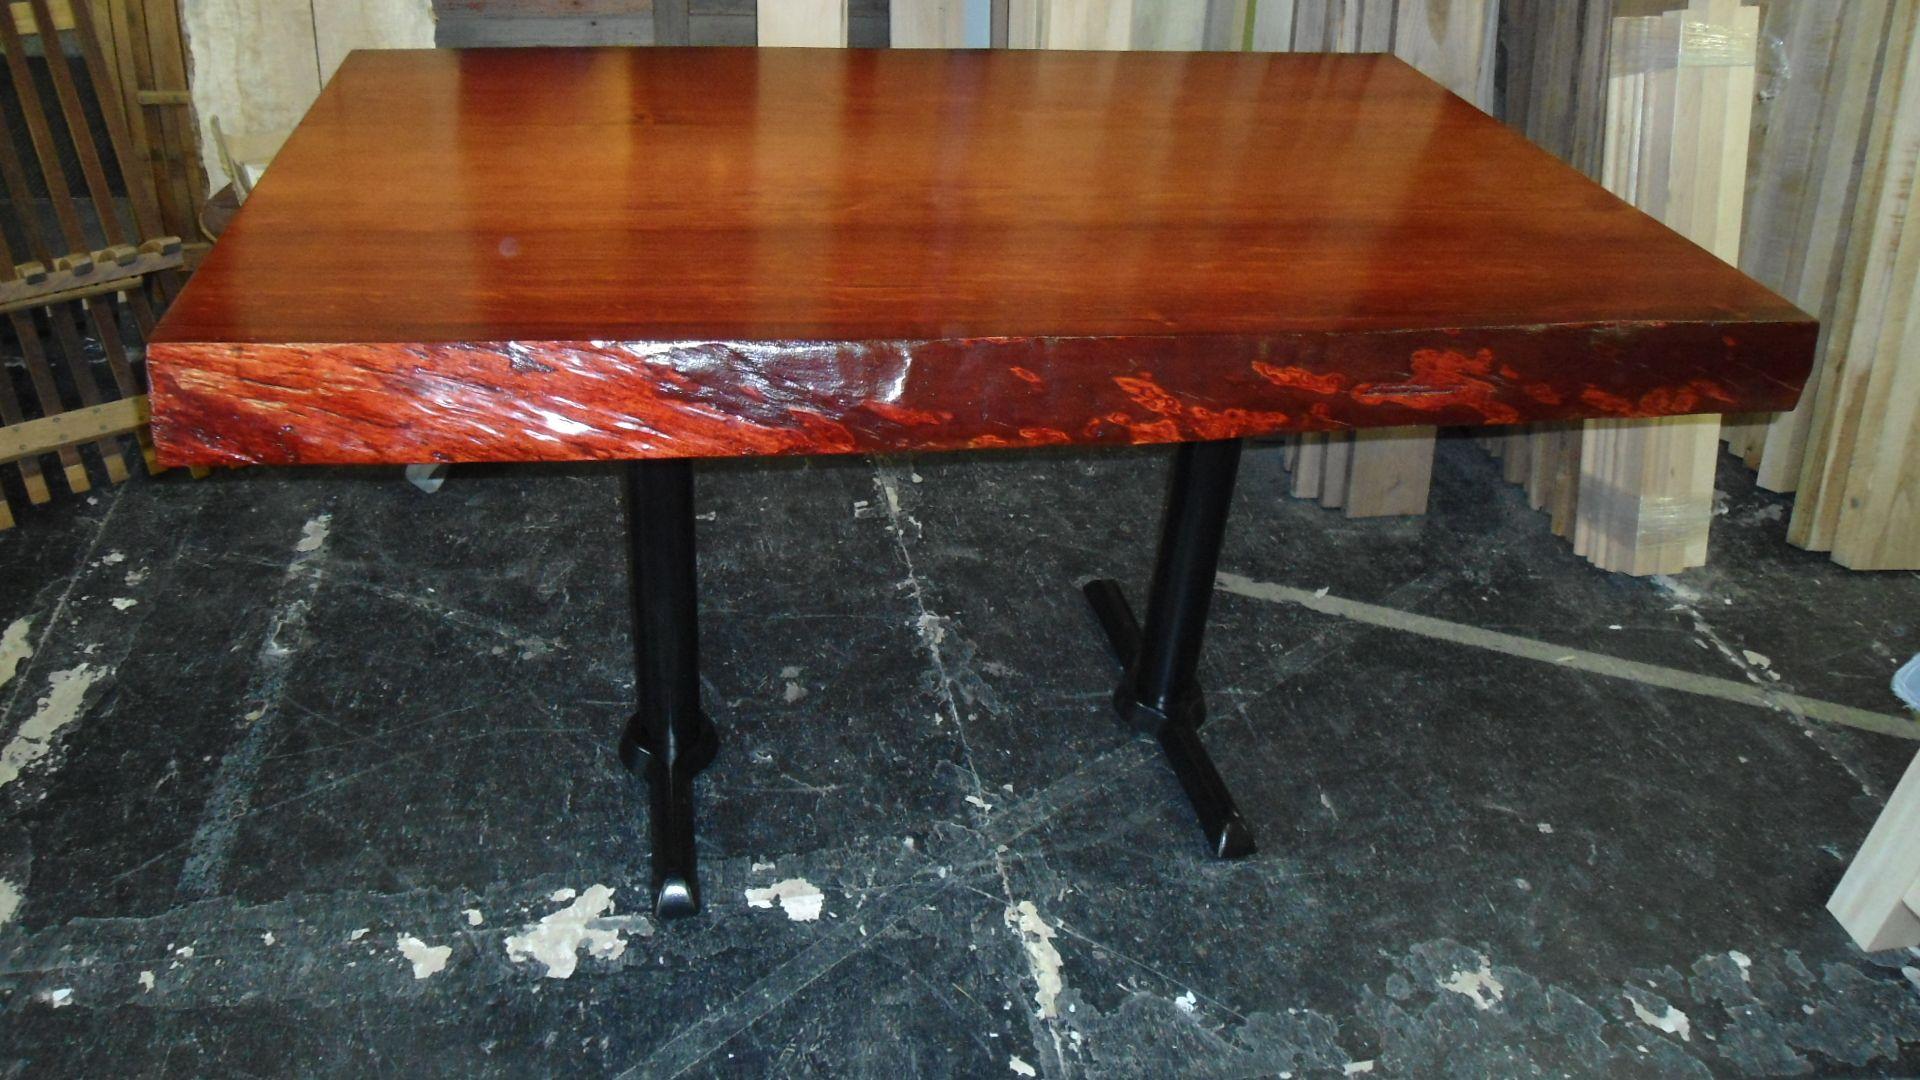 Old Growth Doug Fir Live Edge Slab Table By Refined Rustic Furniture Ltd,  Calgary, Alberta